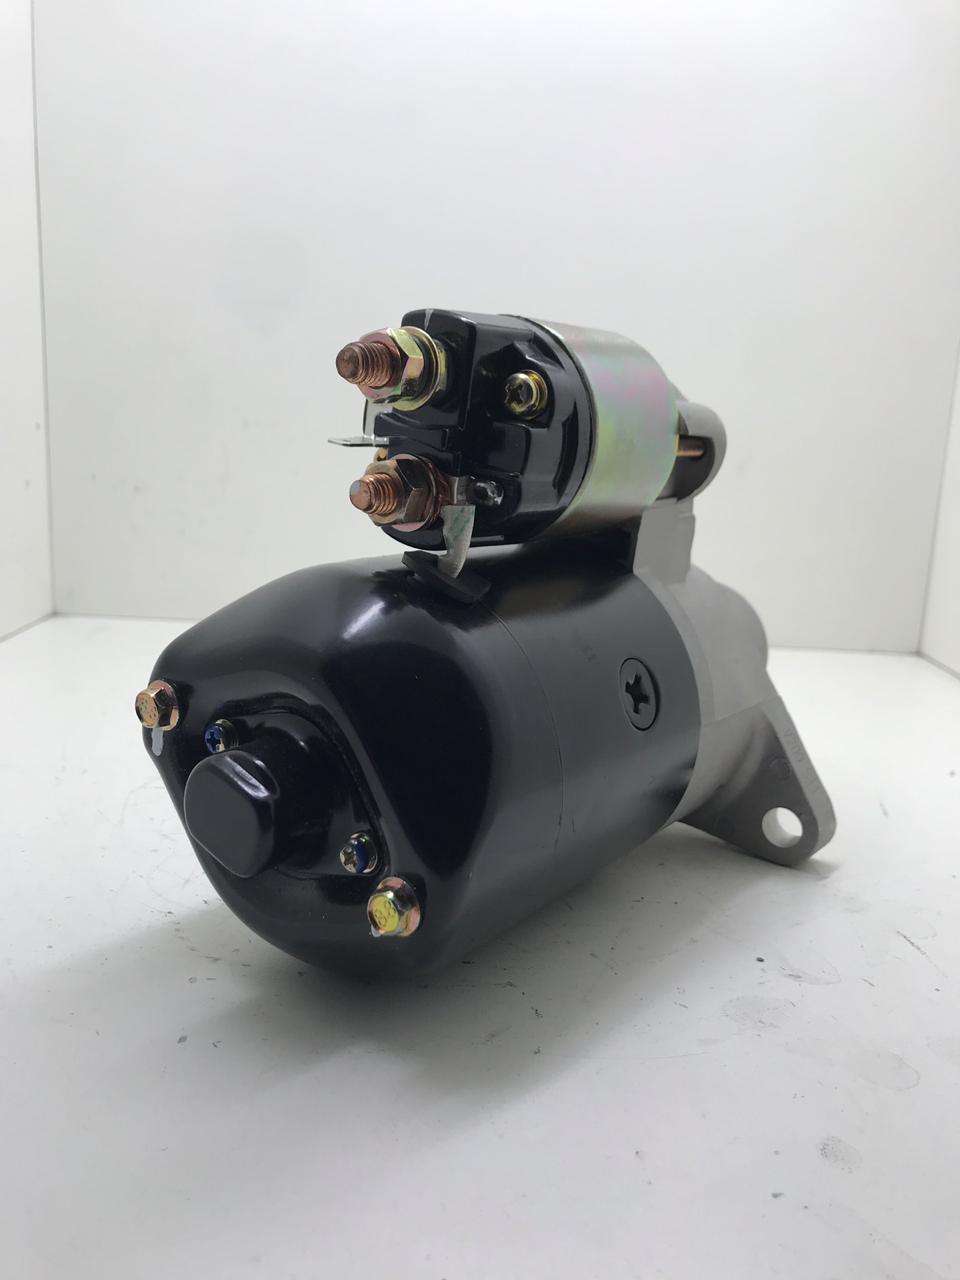 Motor de arranque EFFA TOWNER HAFEI CHANA BRIGHT 12V 8 DENTES QD1127 EFF030 4650208950 AEC14008